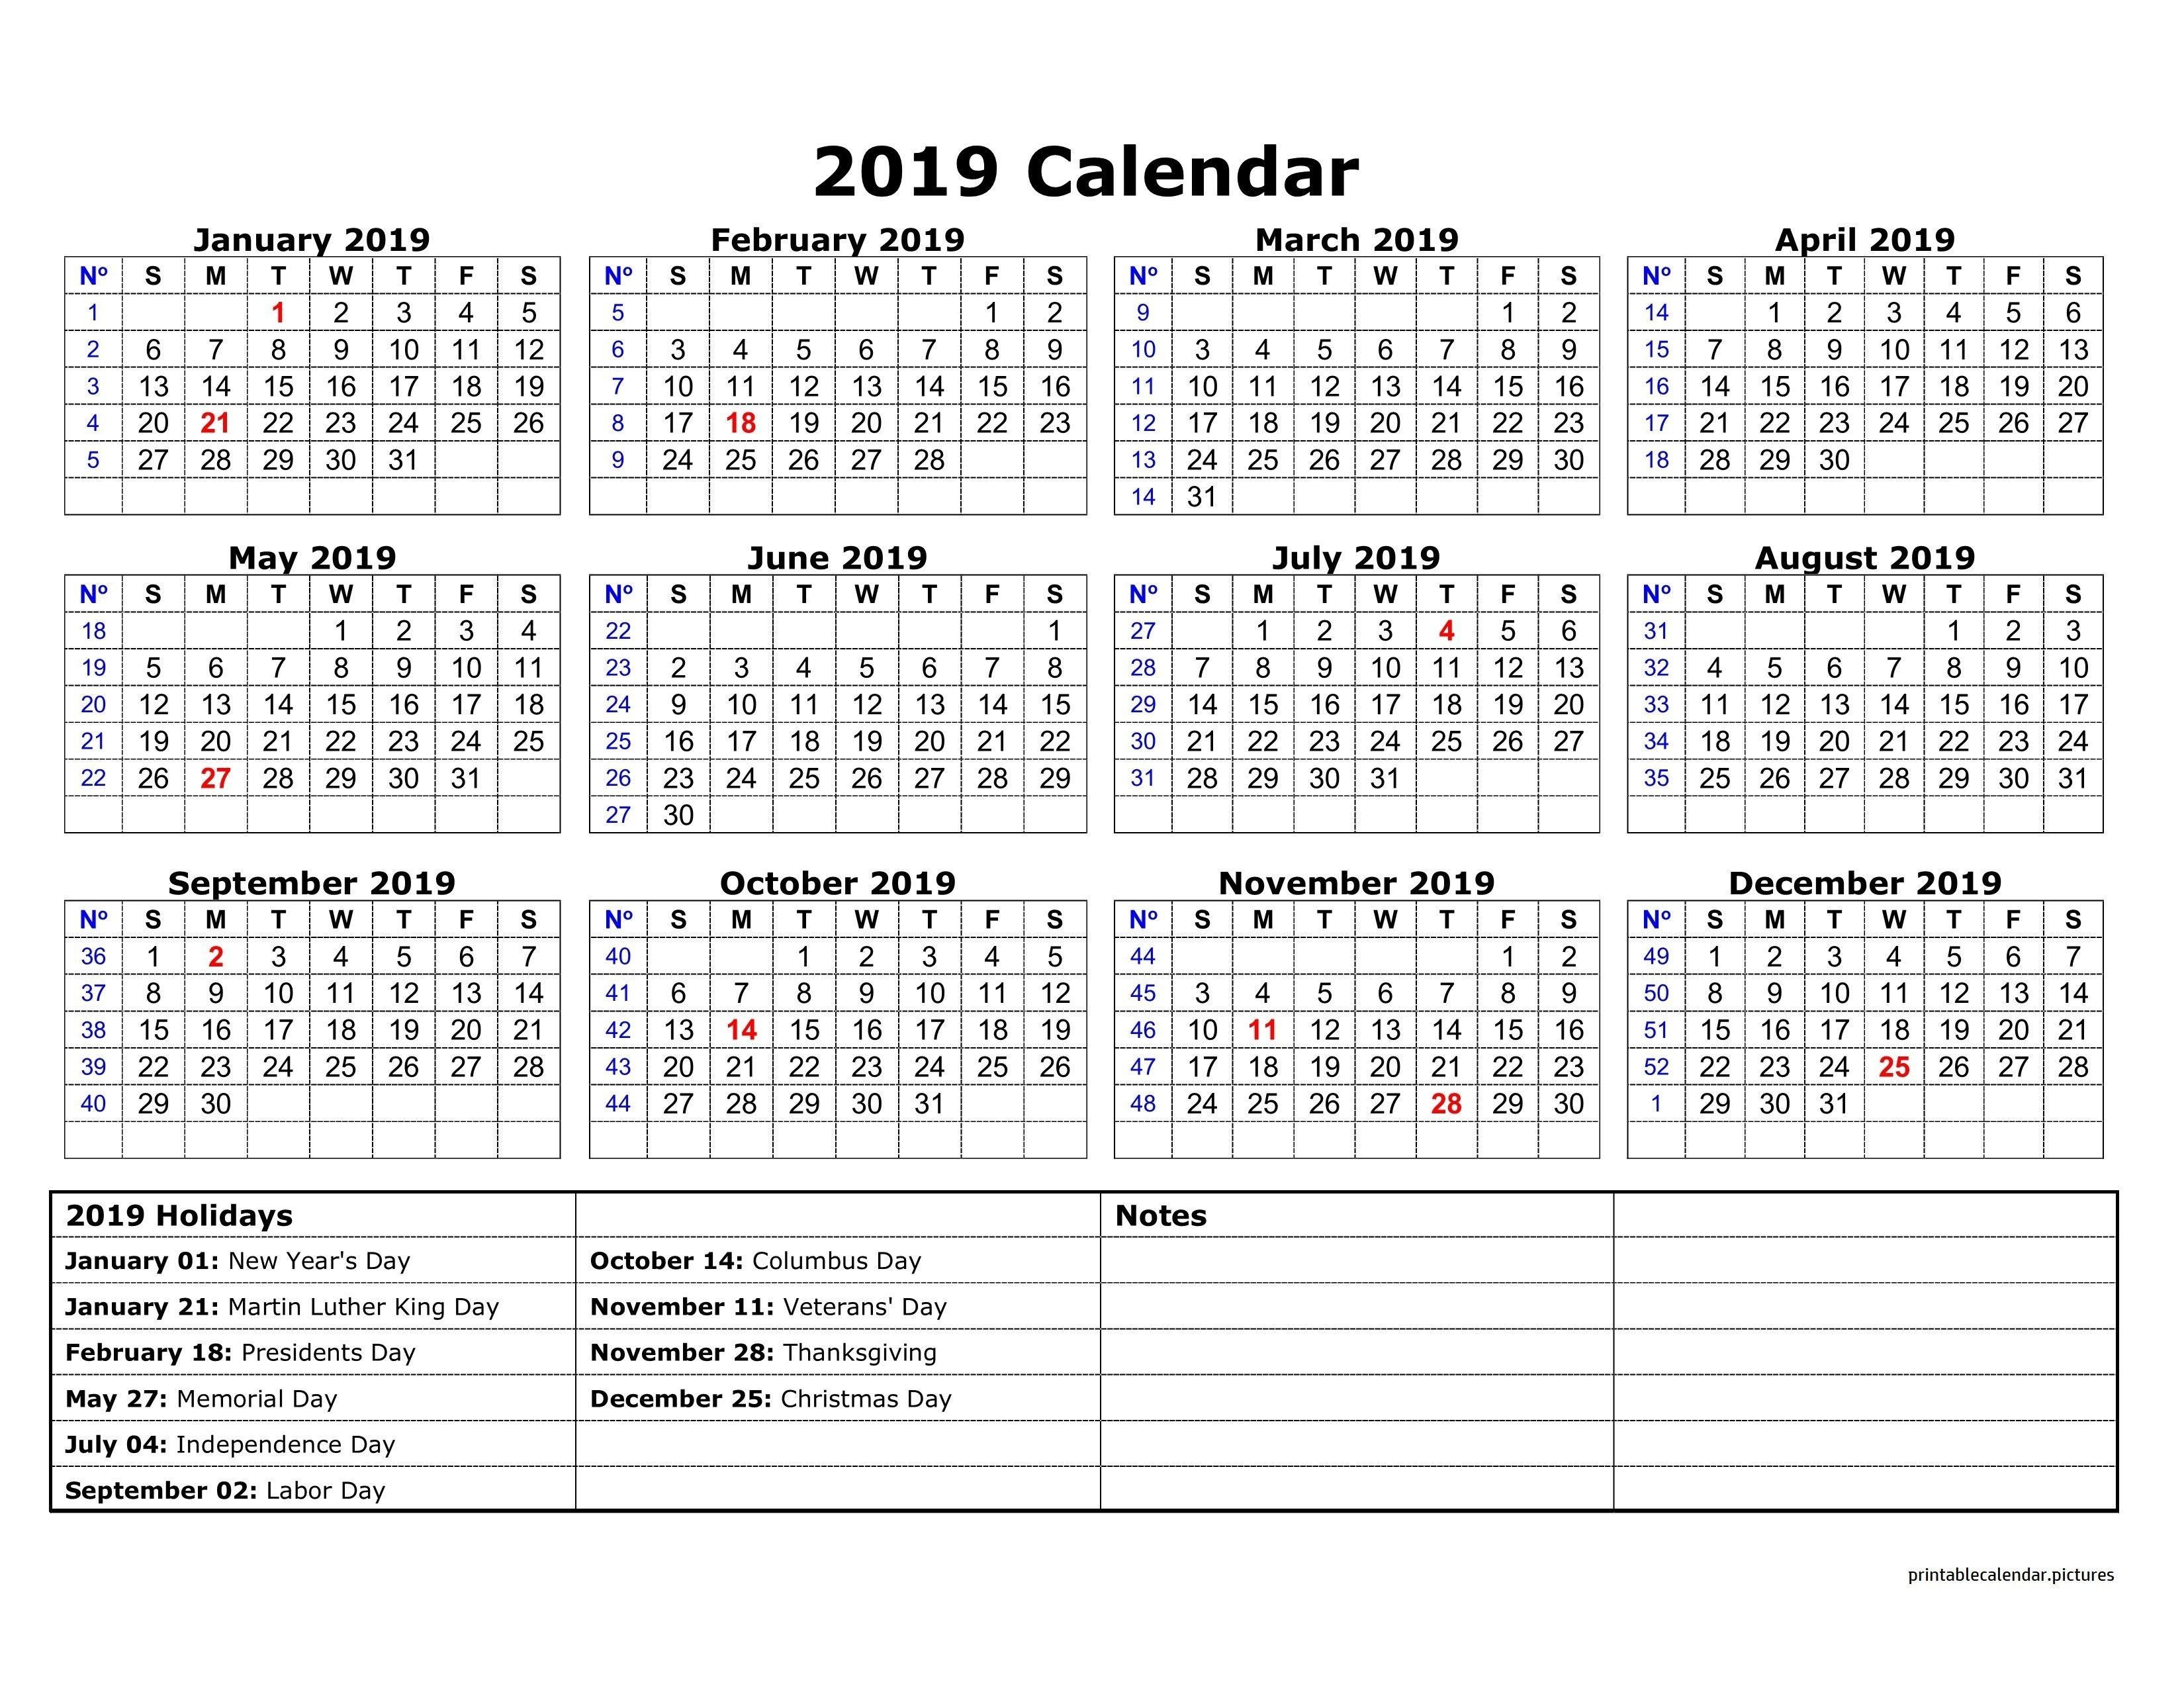 2019 Calendar Holidays Australia | 2019 Calendar Holidays Calendar Year 2019 Australia